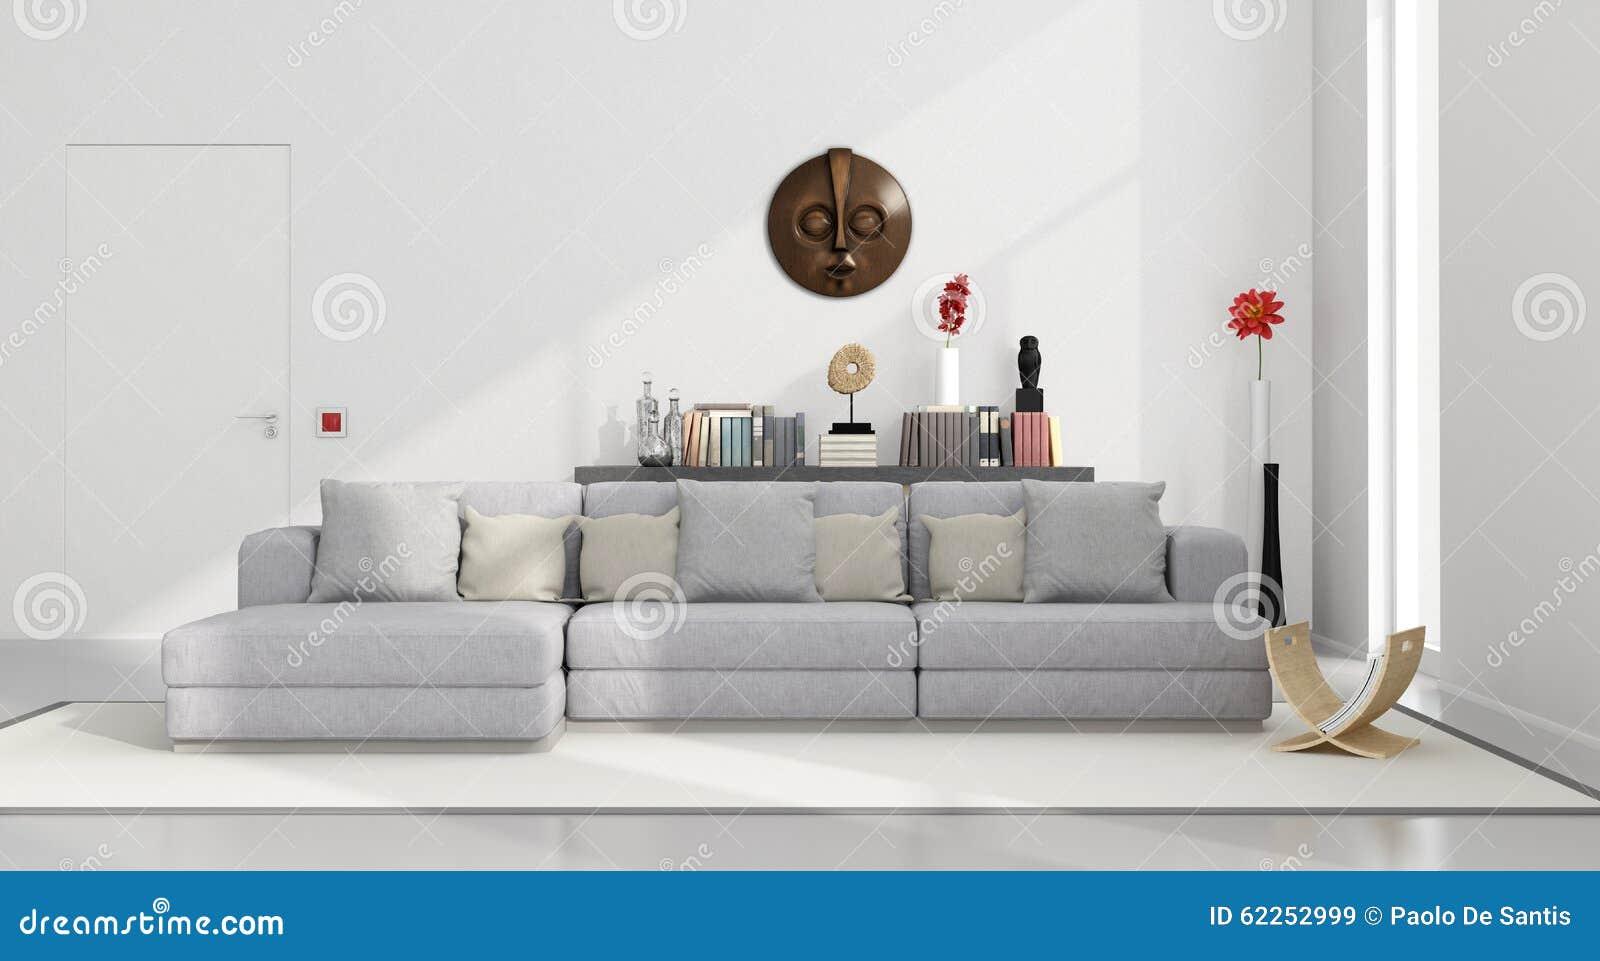 White minimalist living room stock illustration image for White minimalist living room